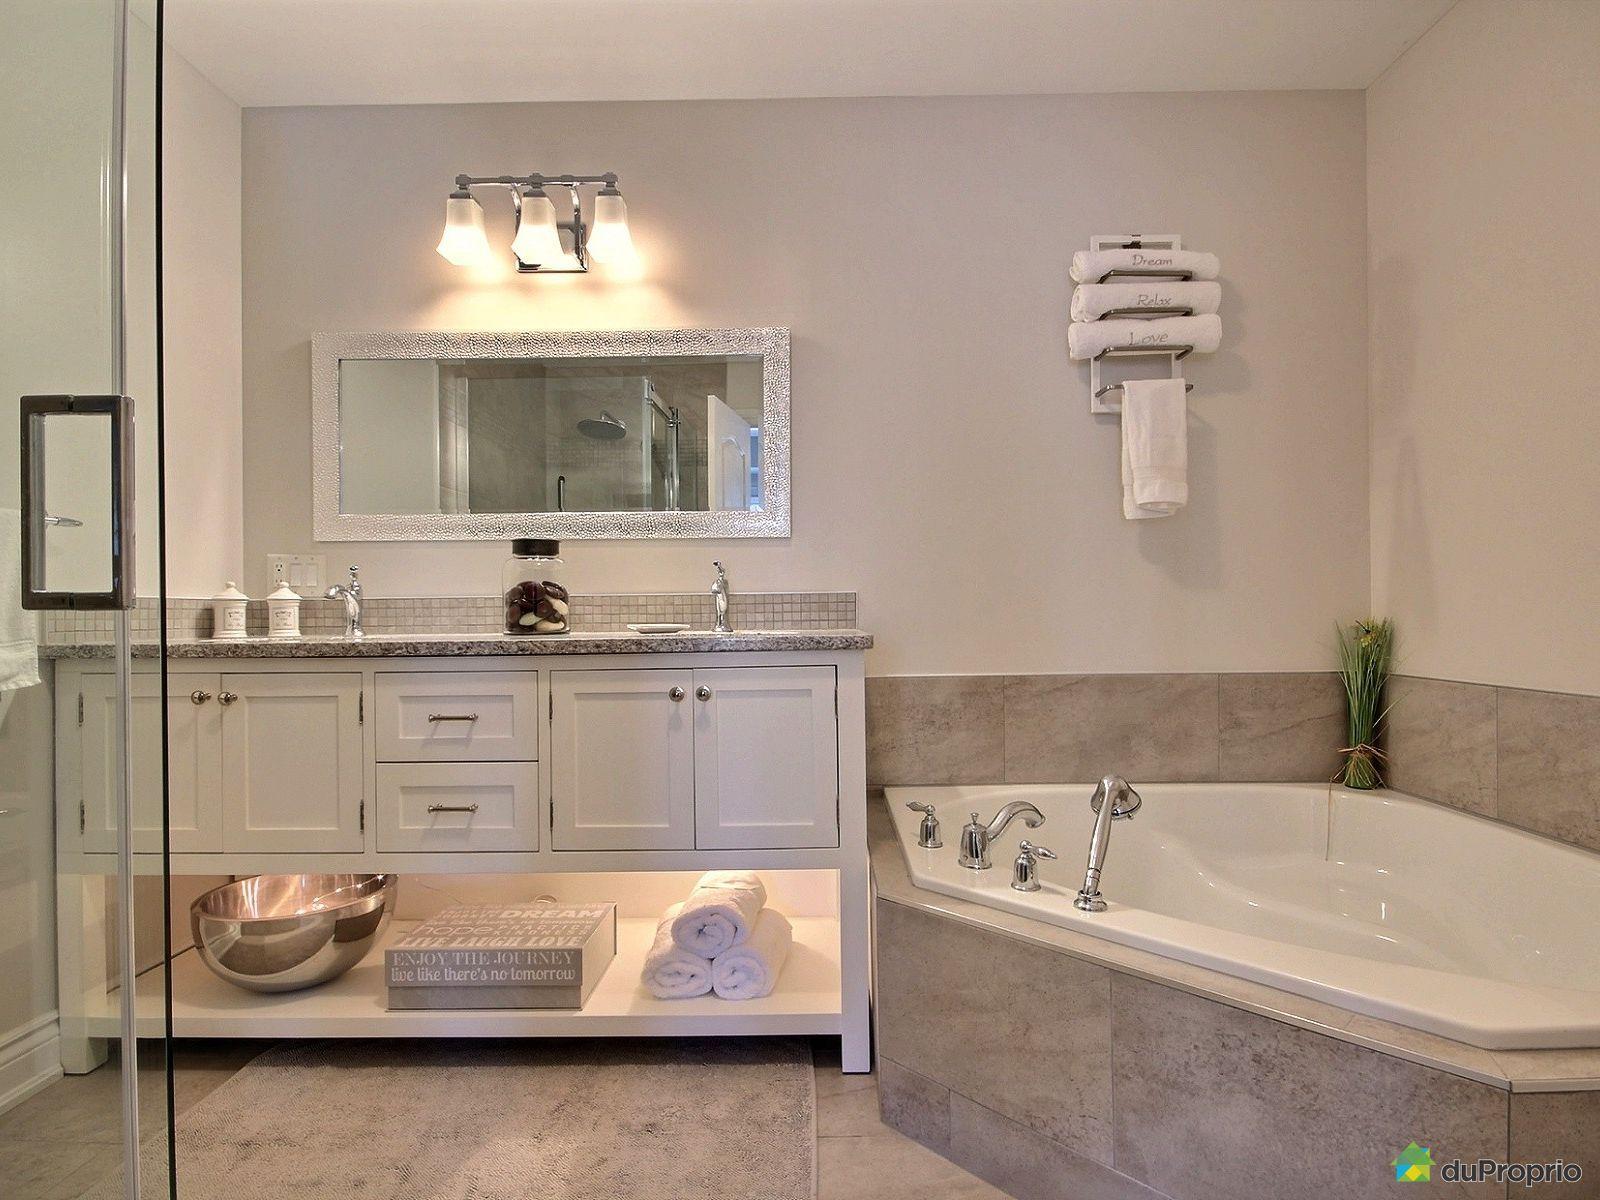 Condo vendre gatineau 303 143 avenue des grands jardins for Decormag salle de bain